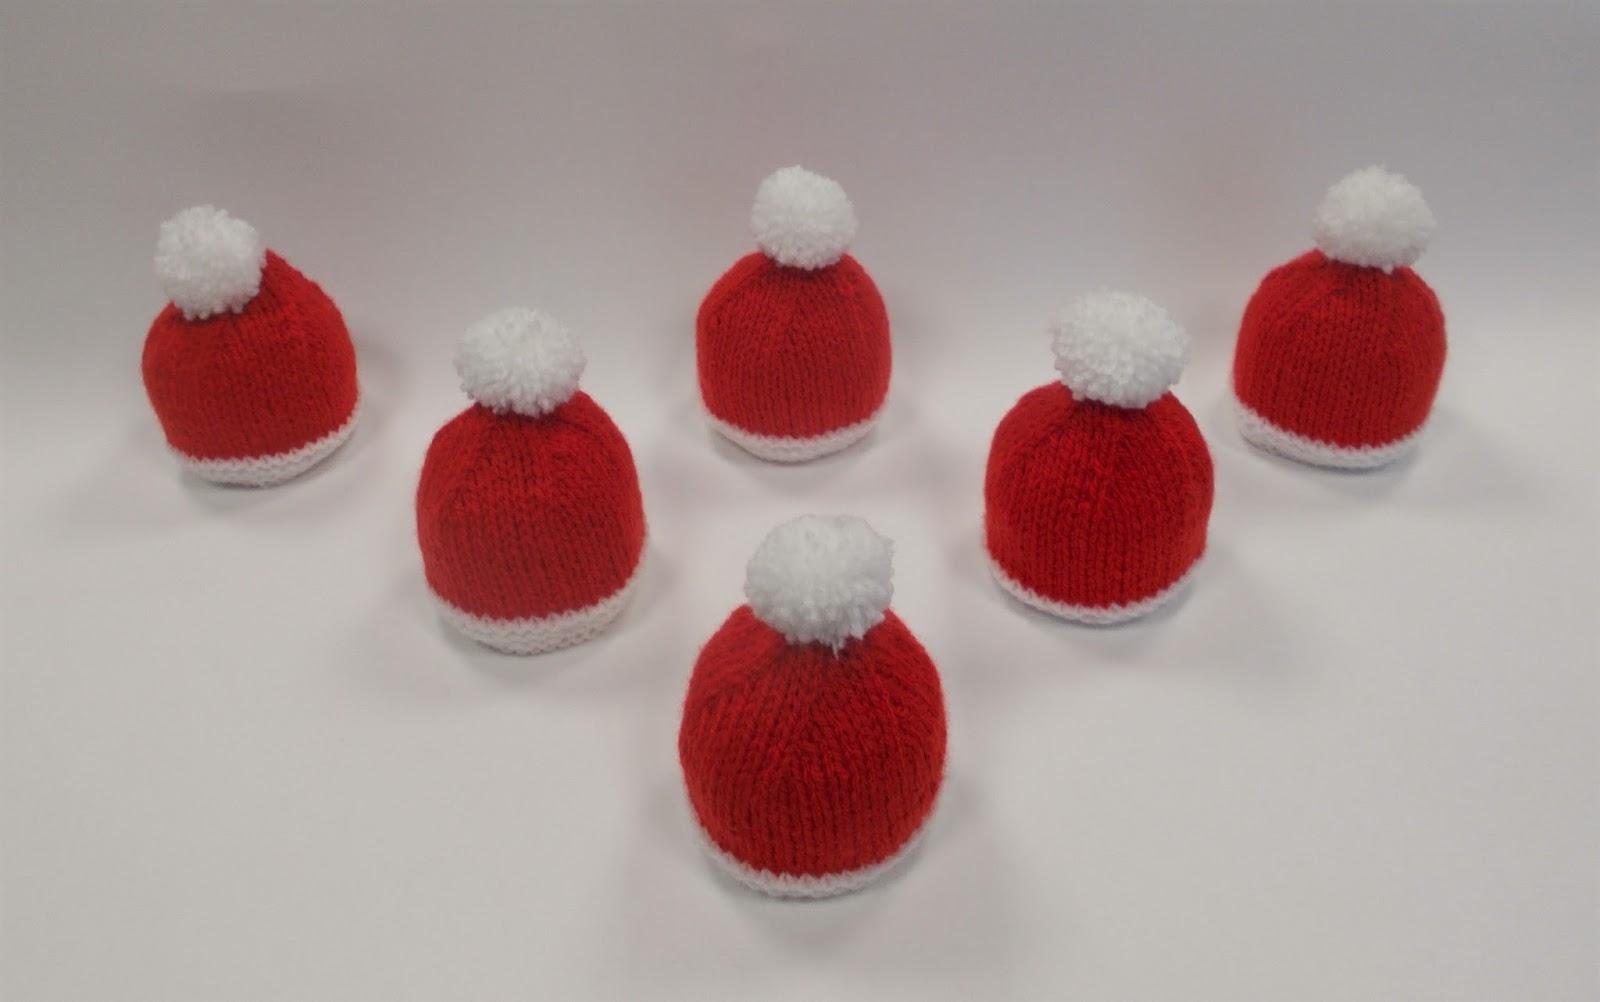 Marianna s Lazy Daisy Days  Chocolate Orange Covers - Christmas ... 173b3909600